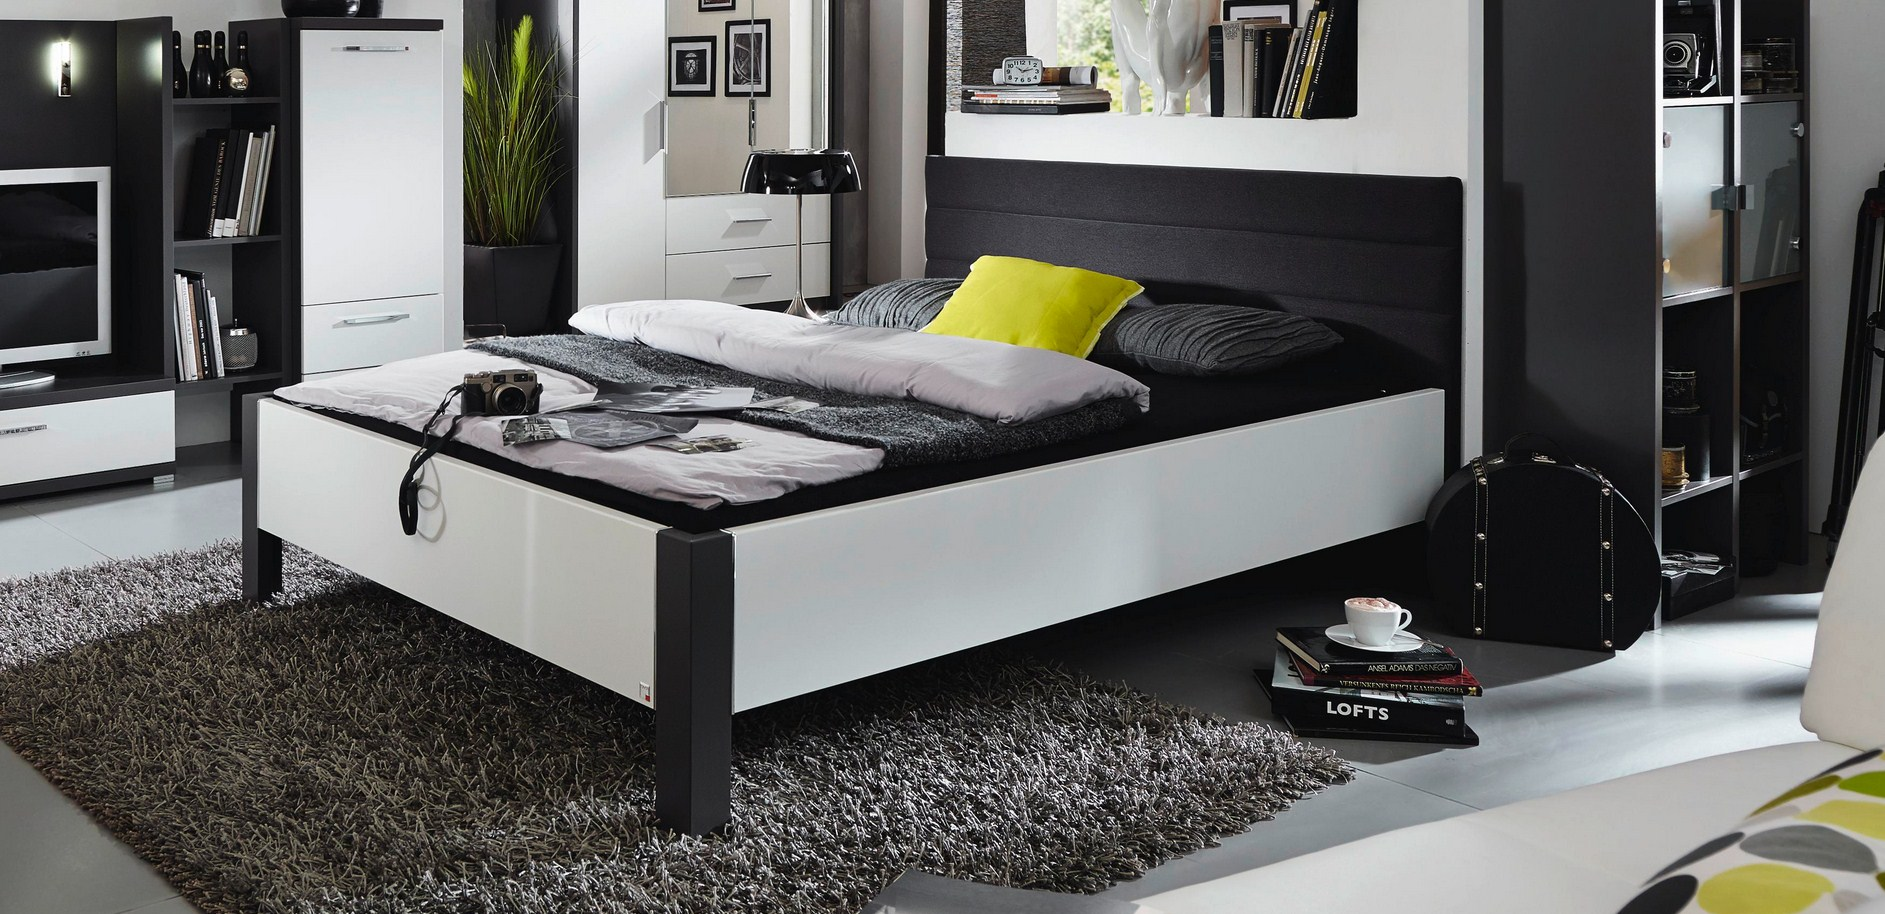 rauch dialog nice4home bett 2 farbig g nstig kaufen m bel universum. Black Bedroom Furniture Sets. Home Design Ideas